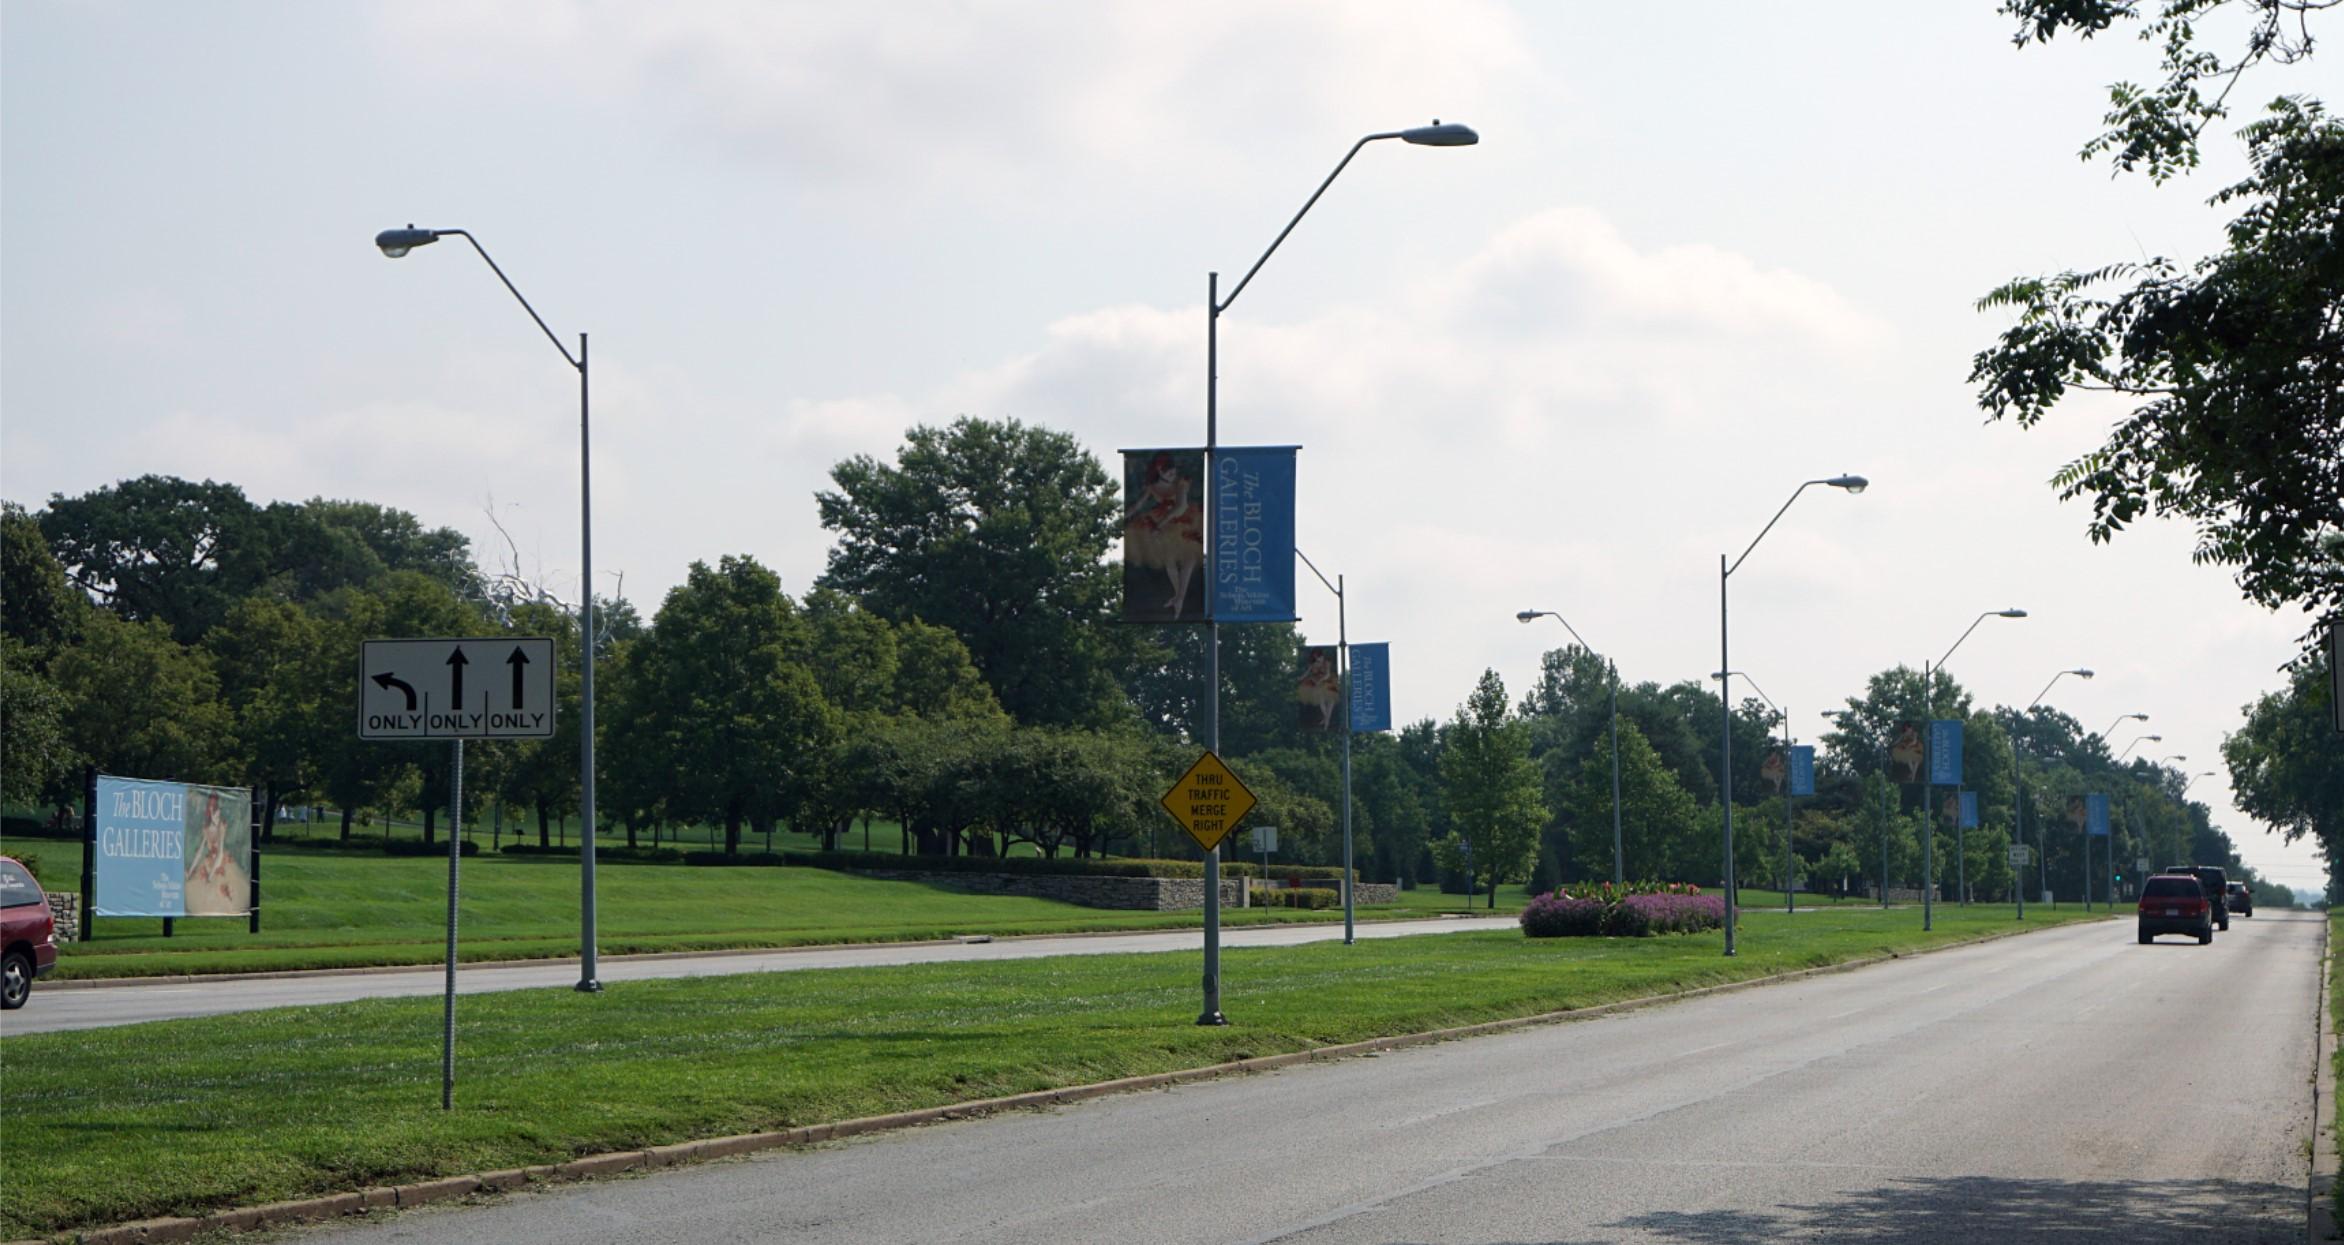 Emanuel Cleaver II Boulevard Bikeway